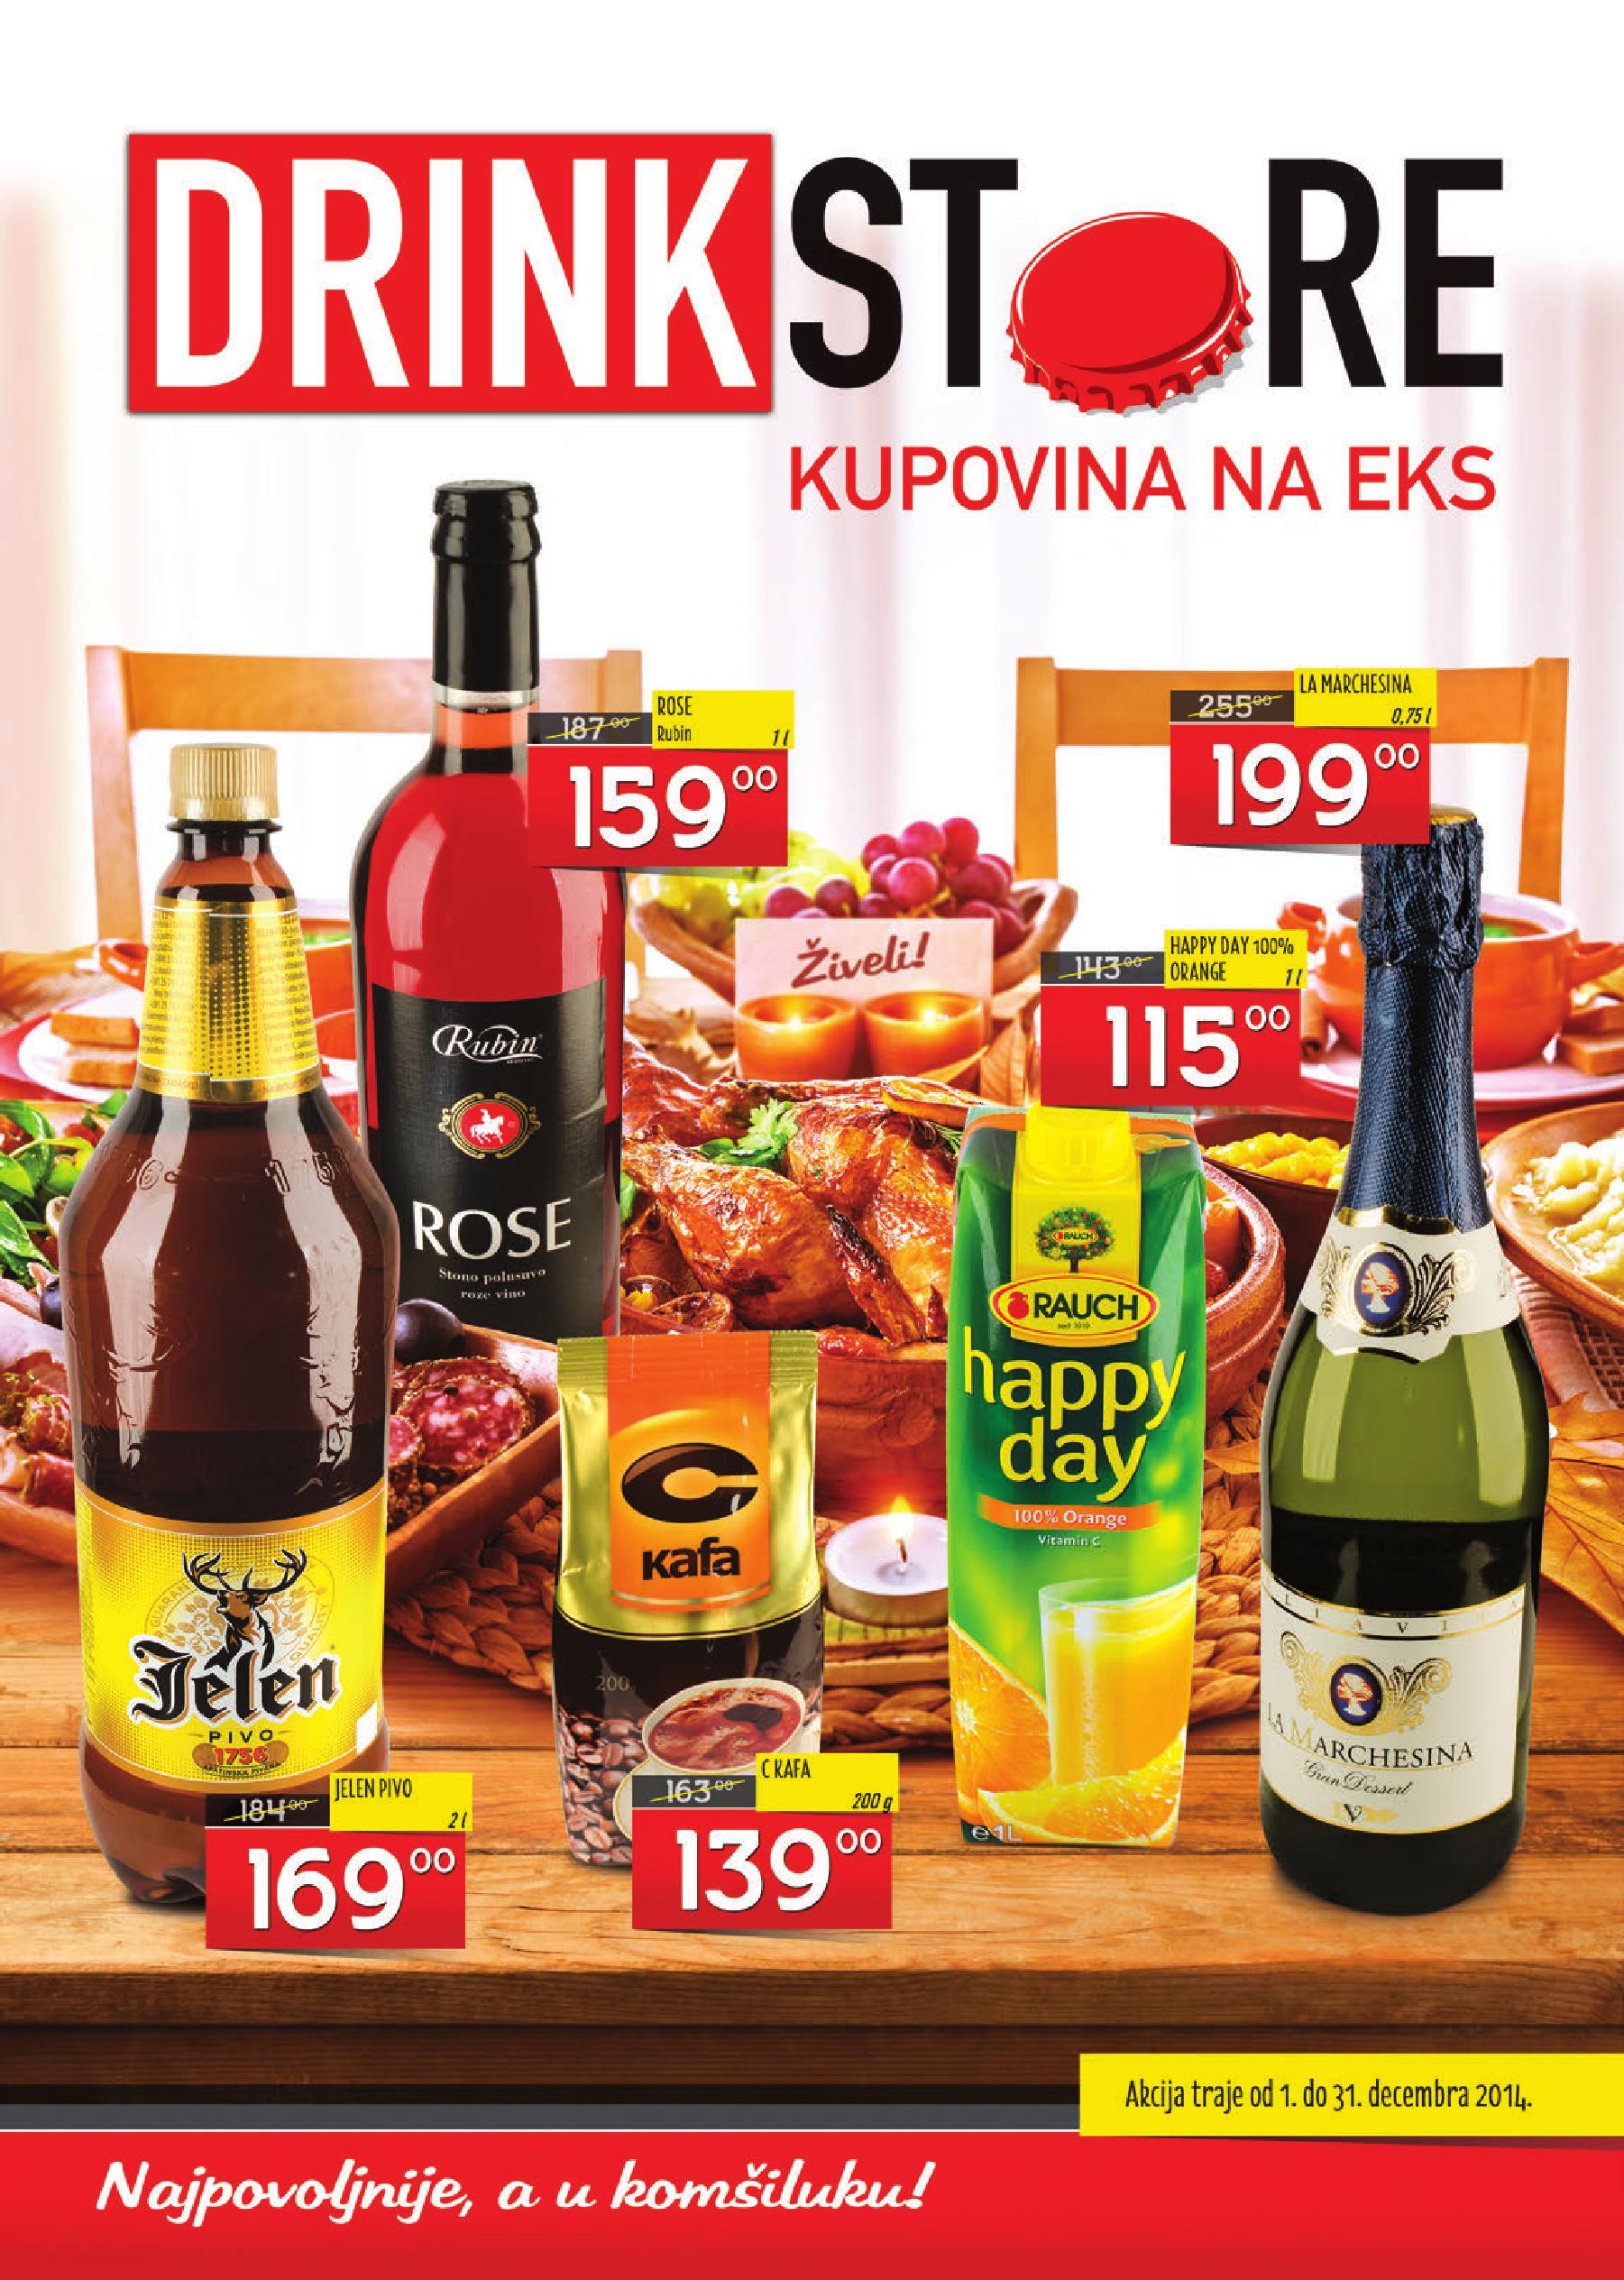 Drink Store akcija decembarske ponude